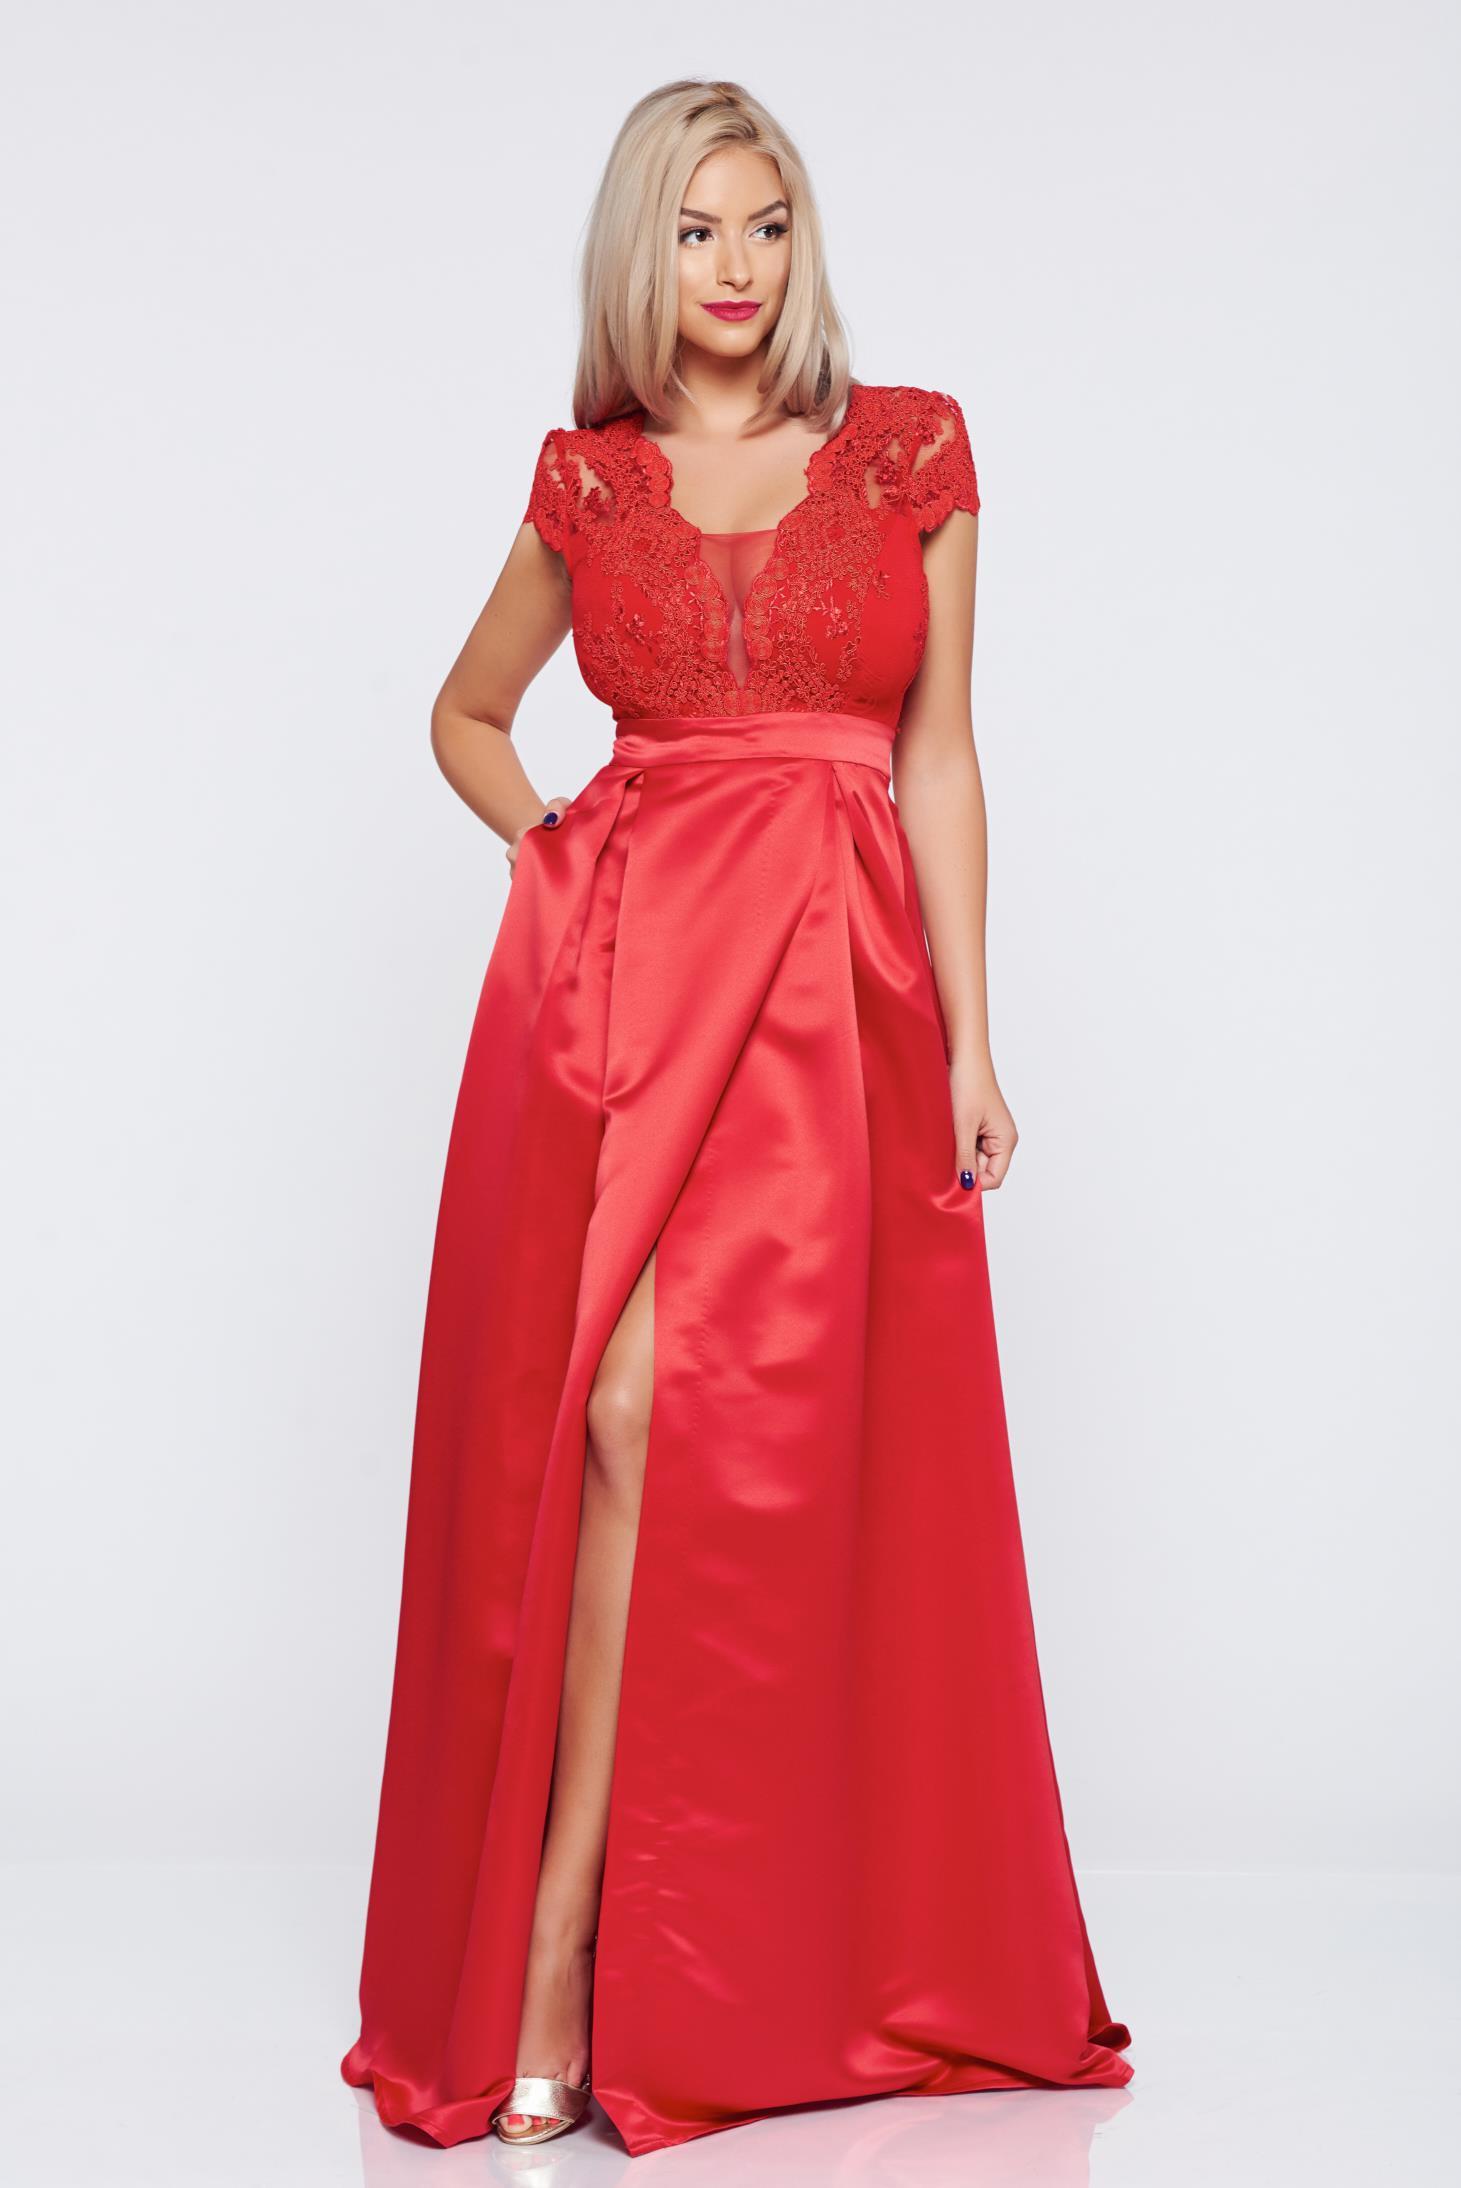 Rochie de ocazie lunga in clos Fofy rosie cu maneca scurta